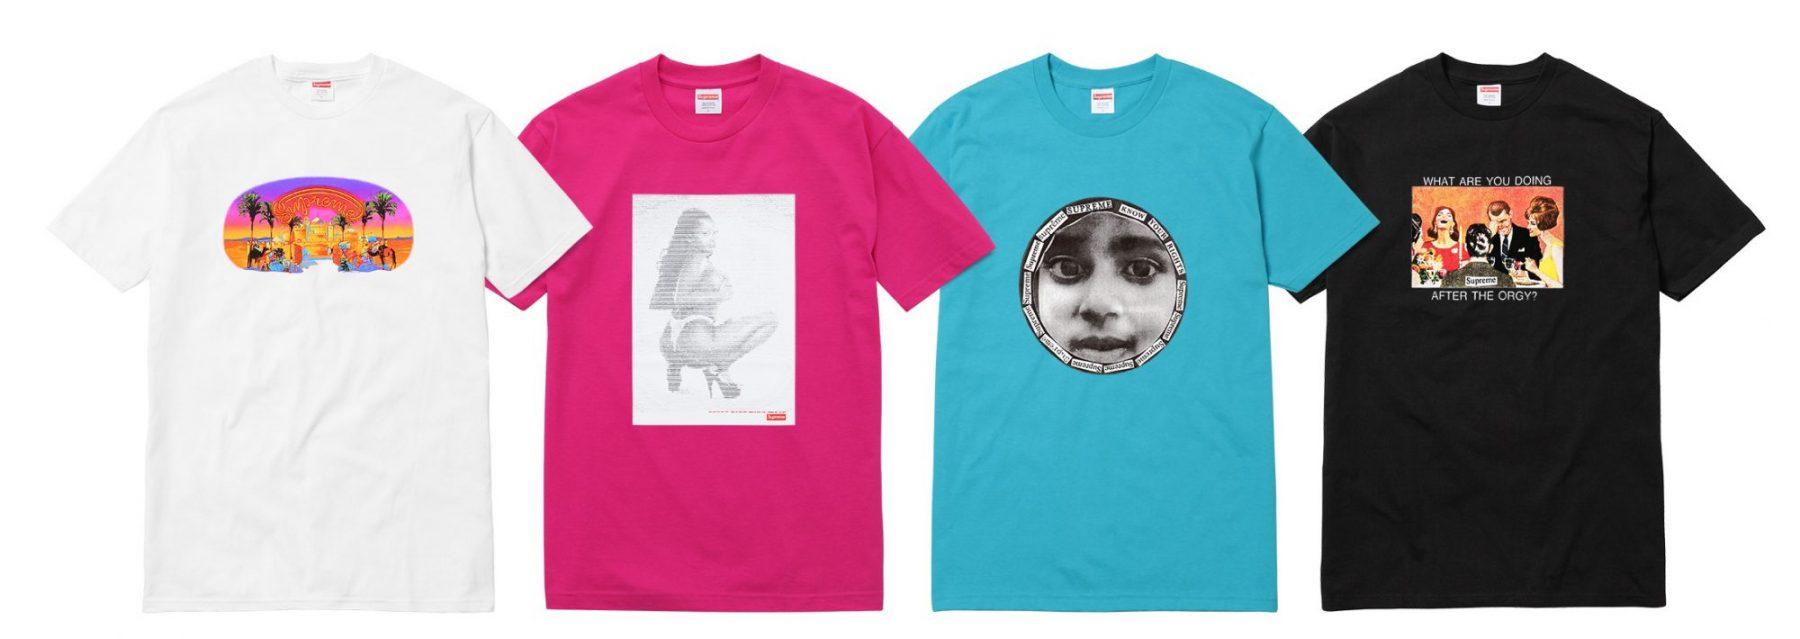 supreme camisetas verao 2017 08 - Supreme colabora com ilustrador Wilfred Limonious